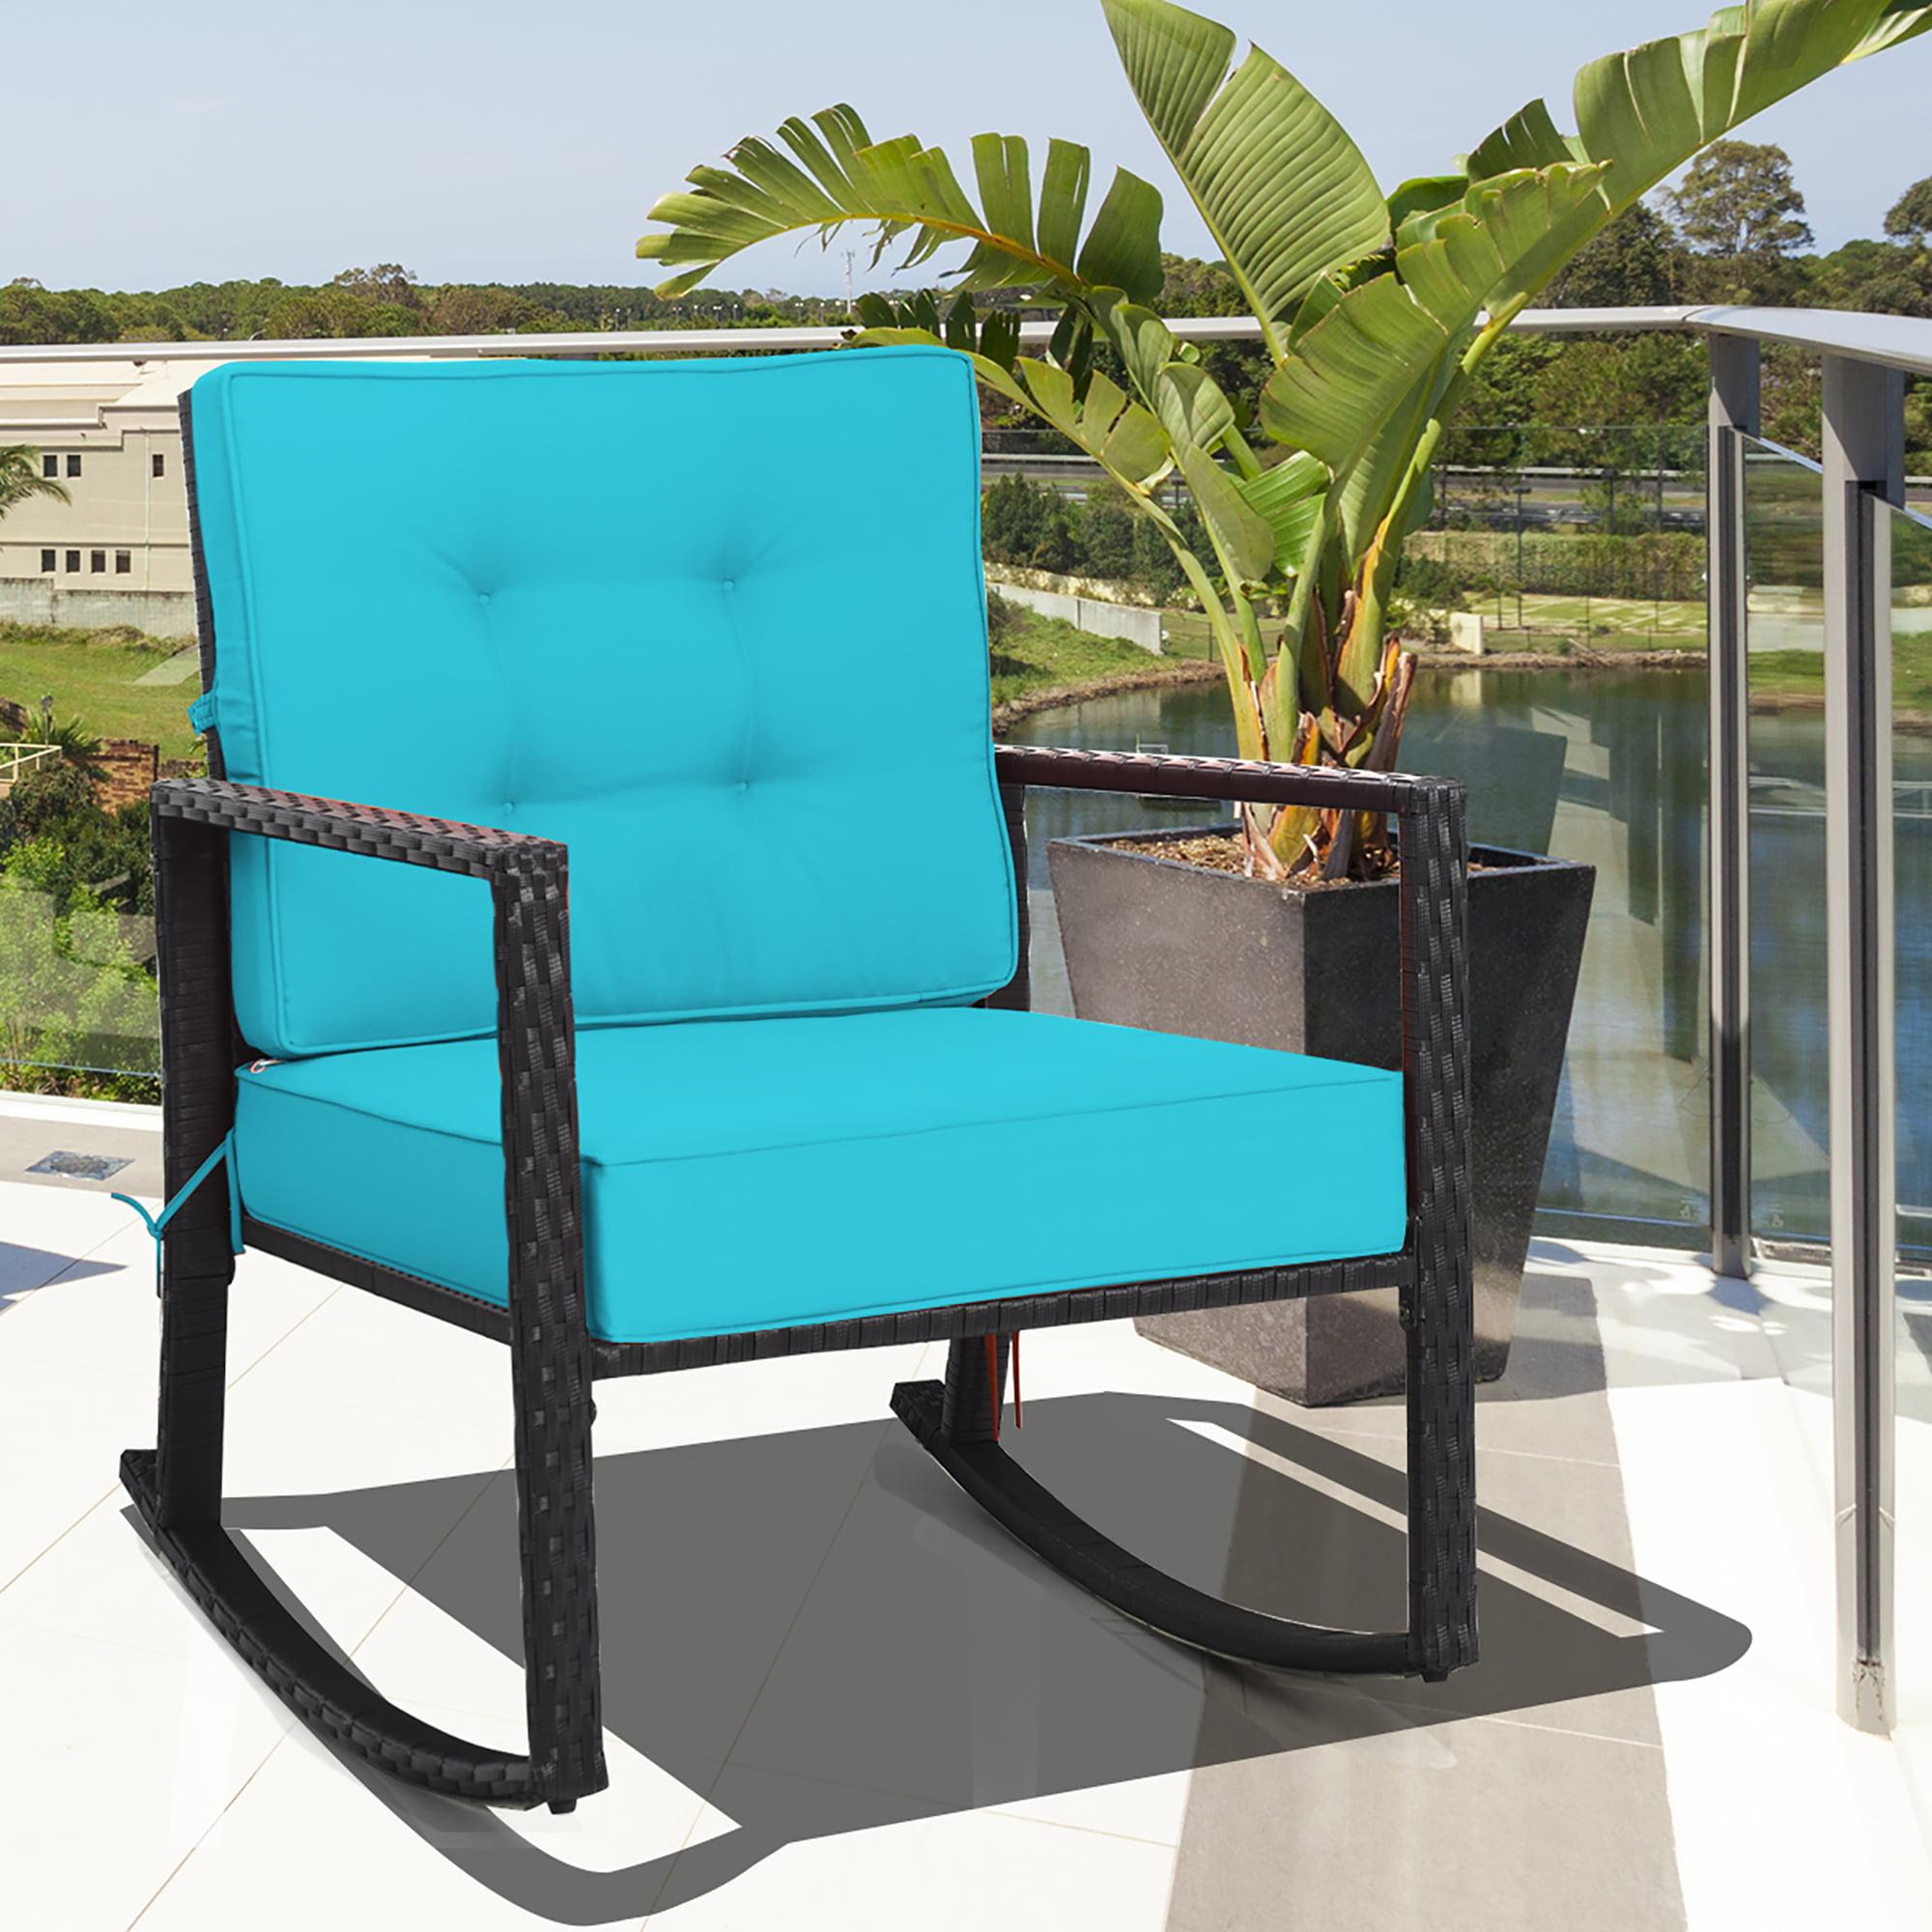 Costway Patio Rattan Rocker Chair, Outdoor Furniture Rocking Chair Cushions